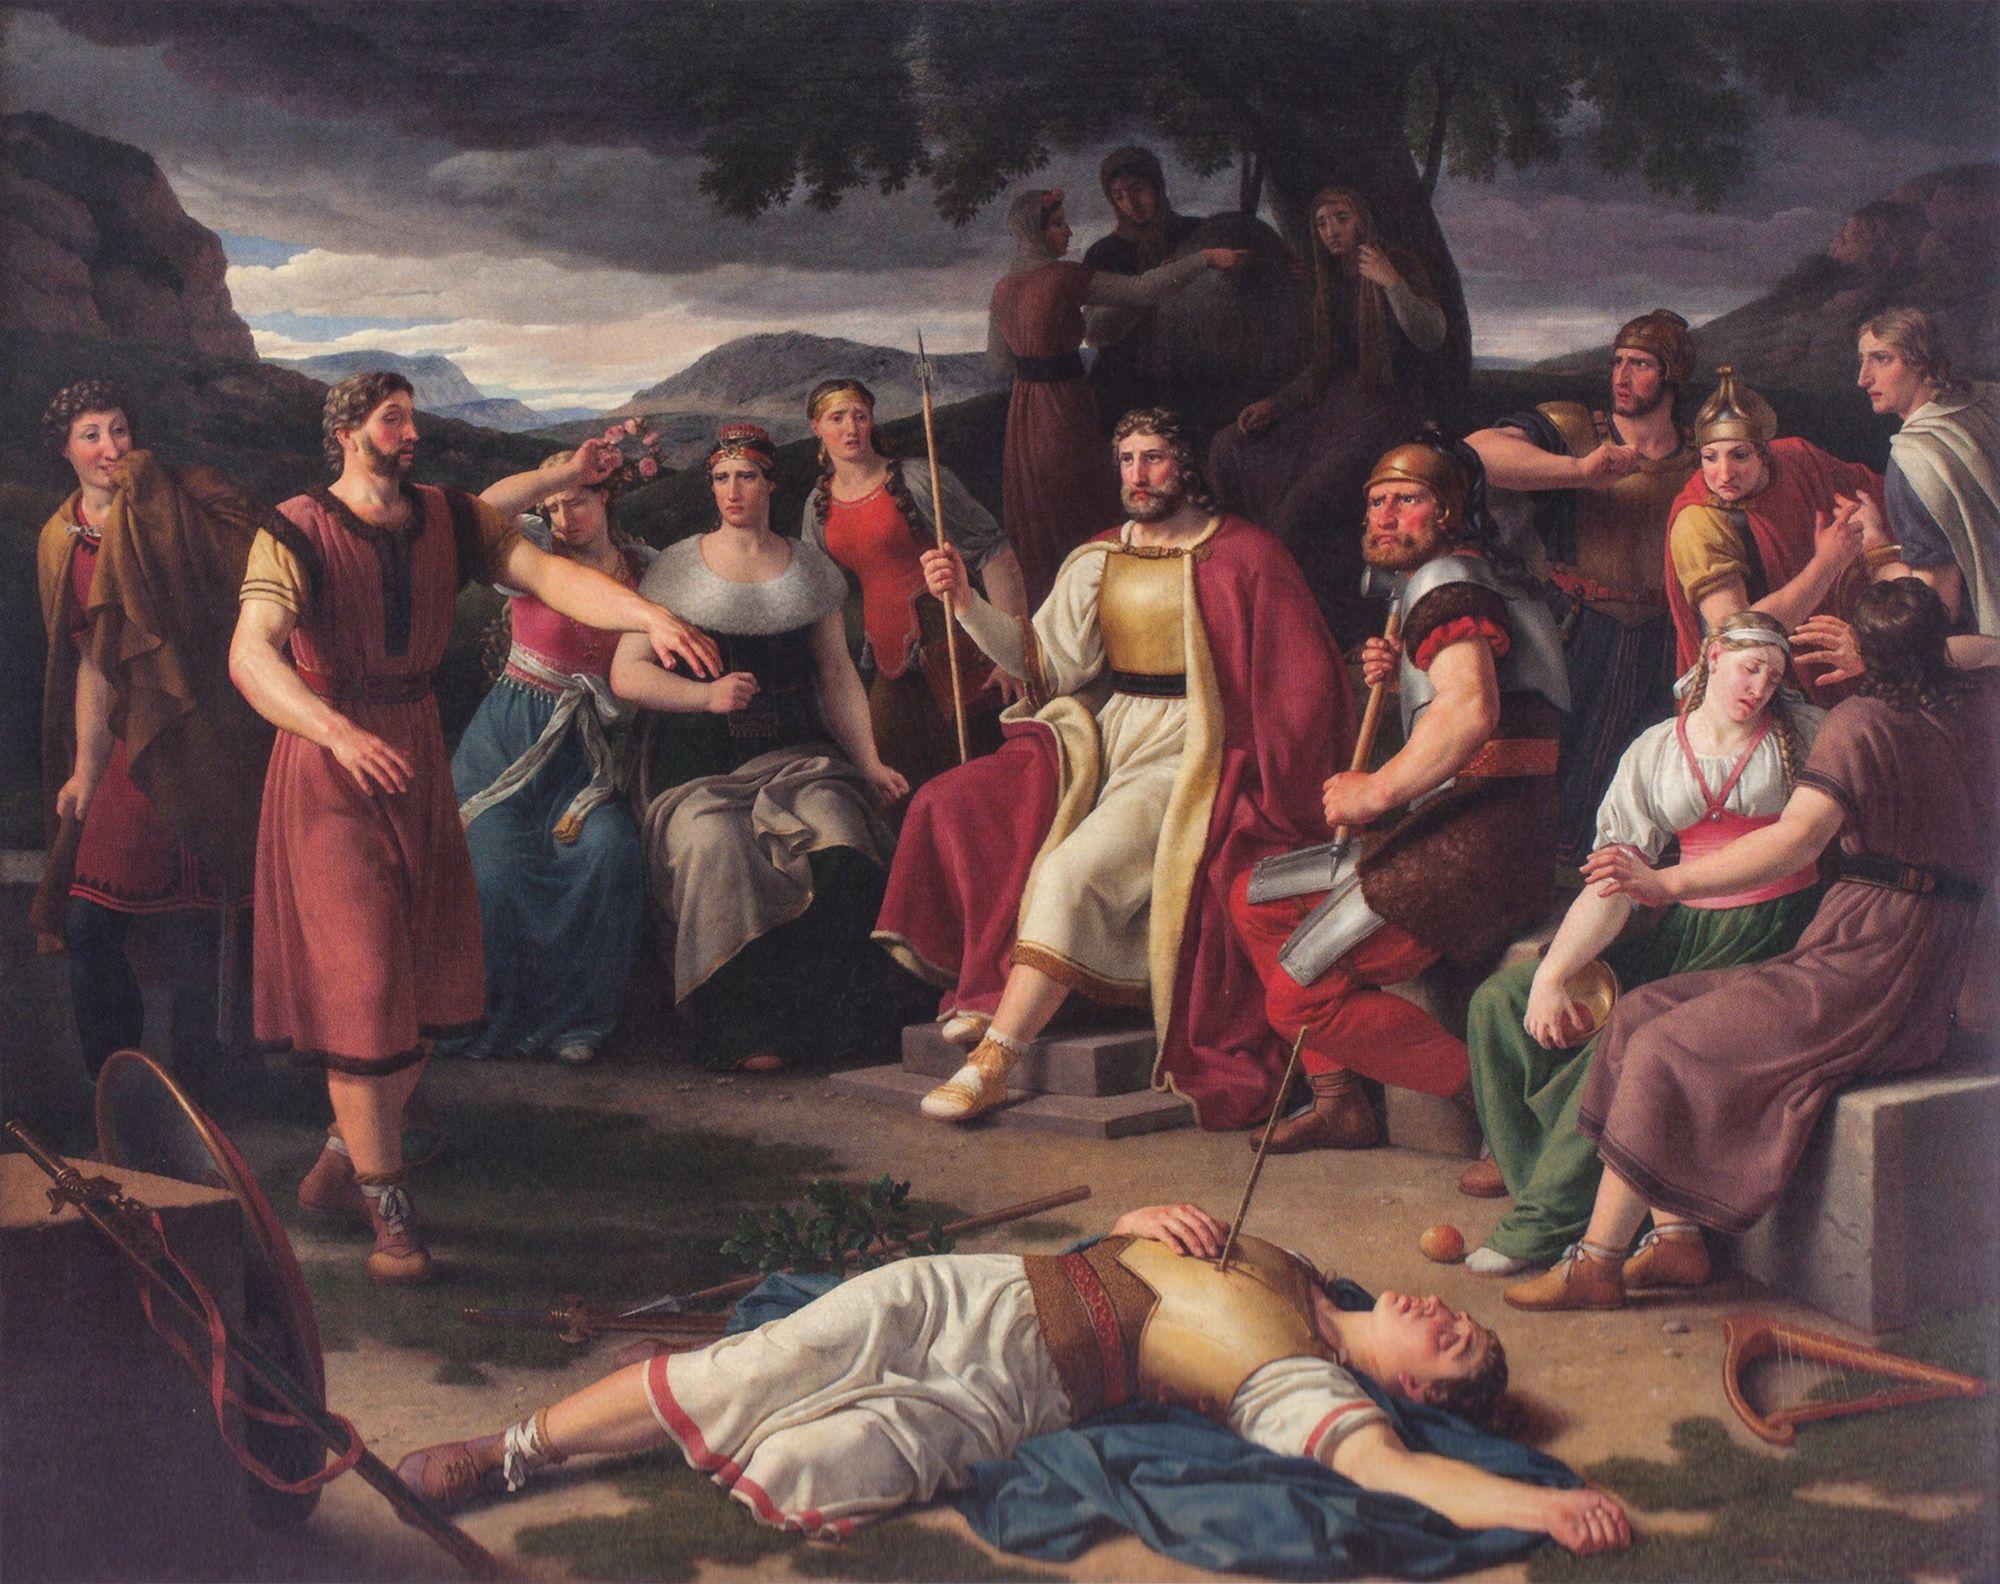 La muerte de Baldr representada por Christoffer Wilhelm Eckersberg